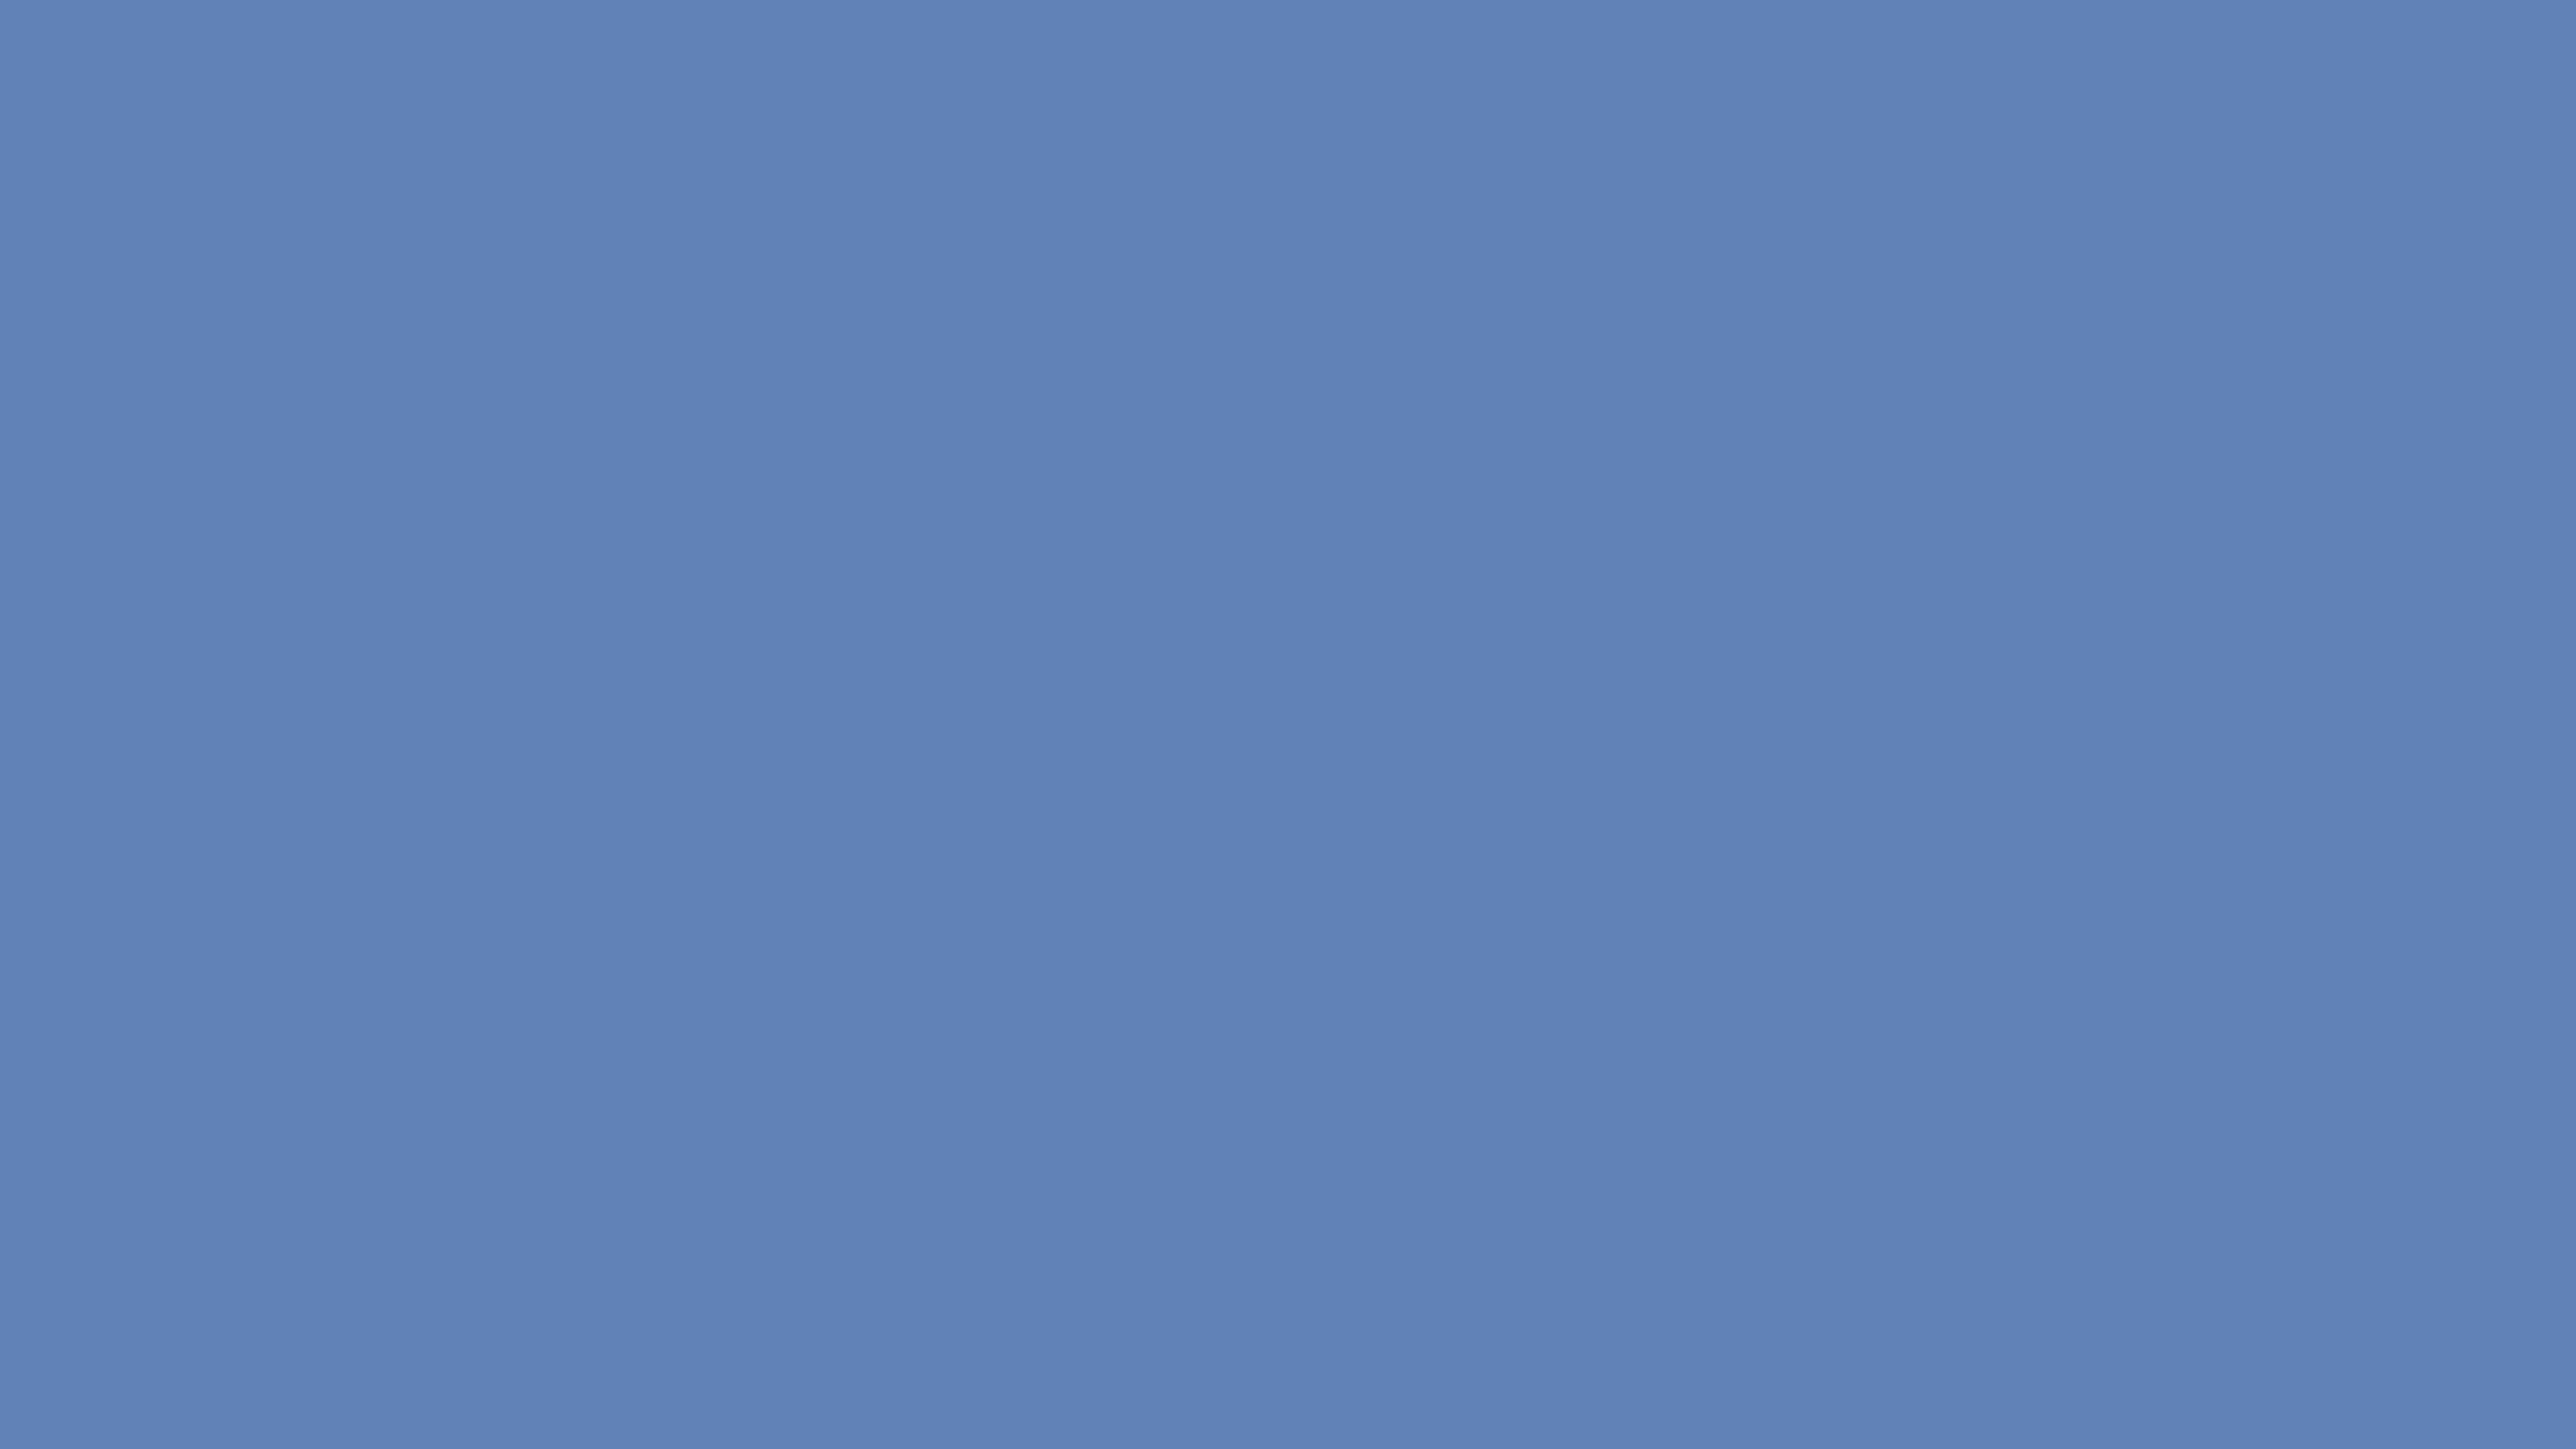 3840x2160 Glaucous Solid Color Background